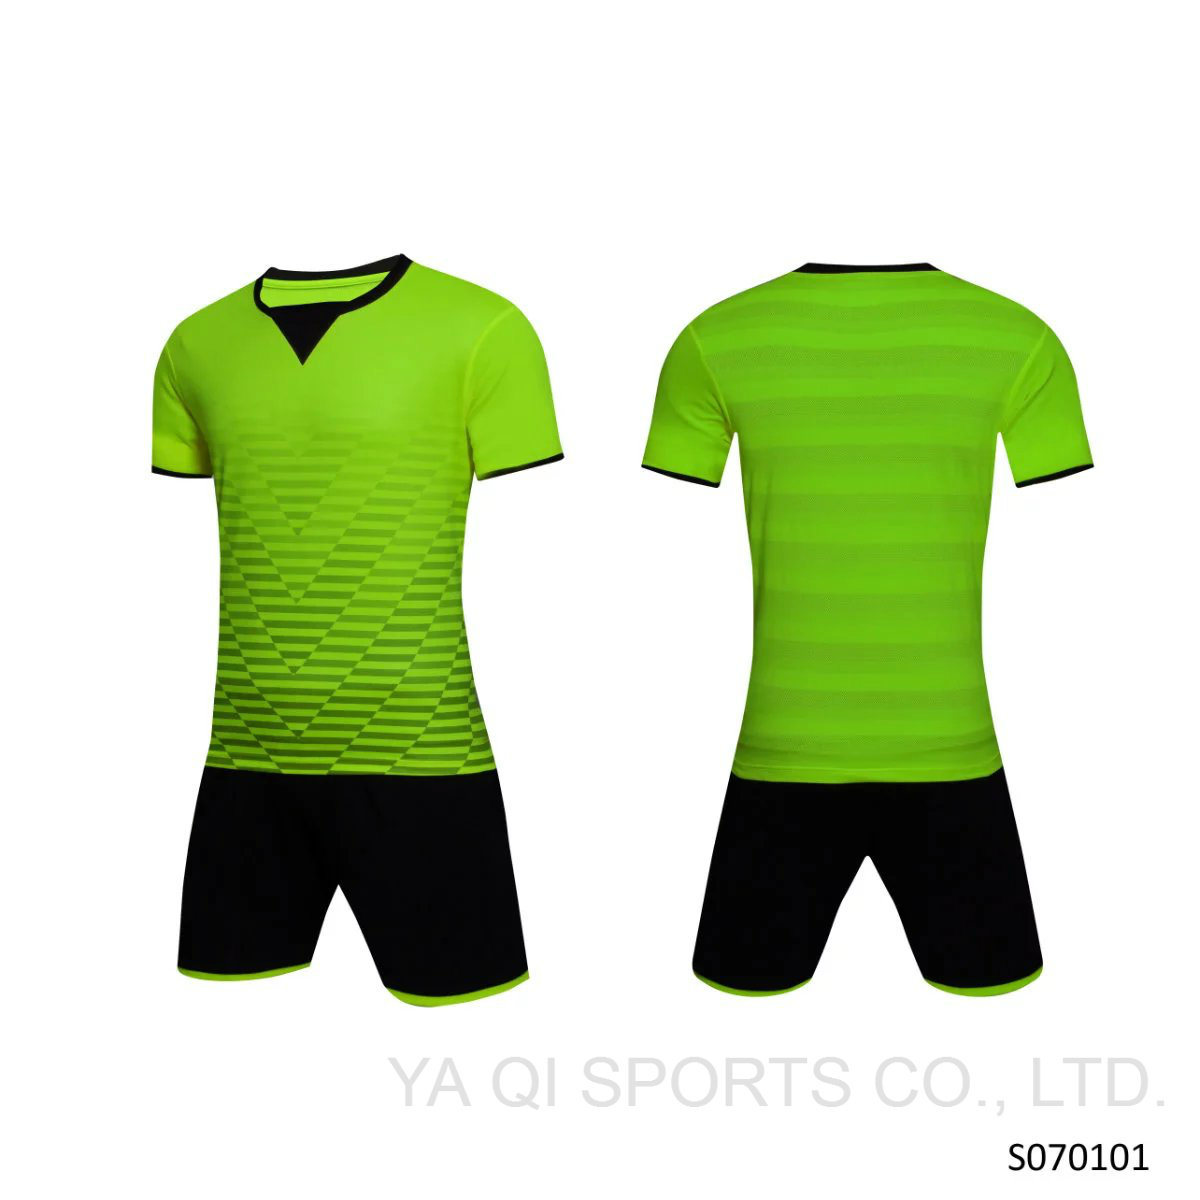 bd64d3b5a9c Wholesale China Soccer Jerseys, Sublimation China Cheap Sportswear, Custom  Cheap Football Kits China - China Soccer Jersey, Football Shirt